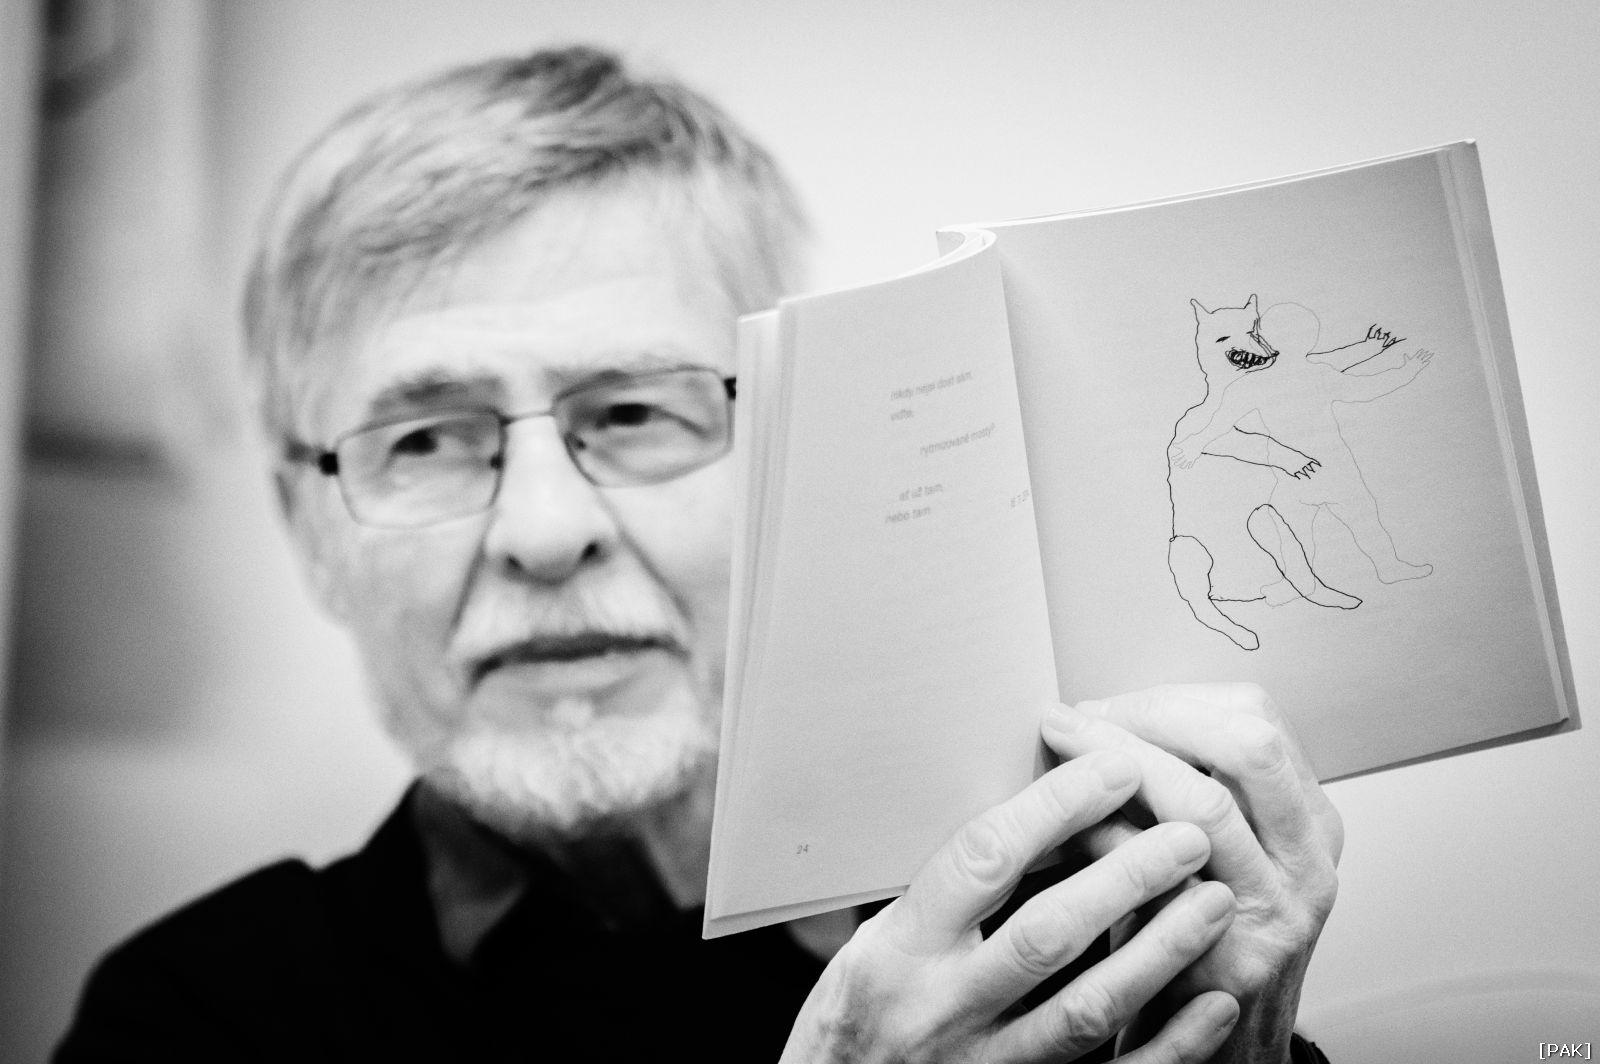 Básník a psychiatr Michal Maršálek